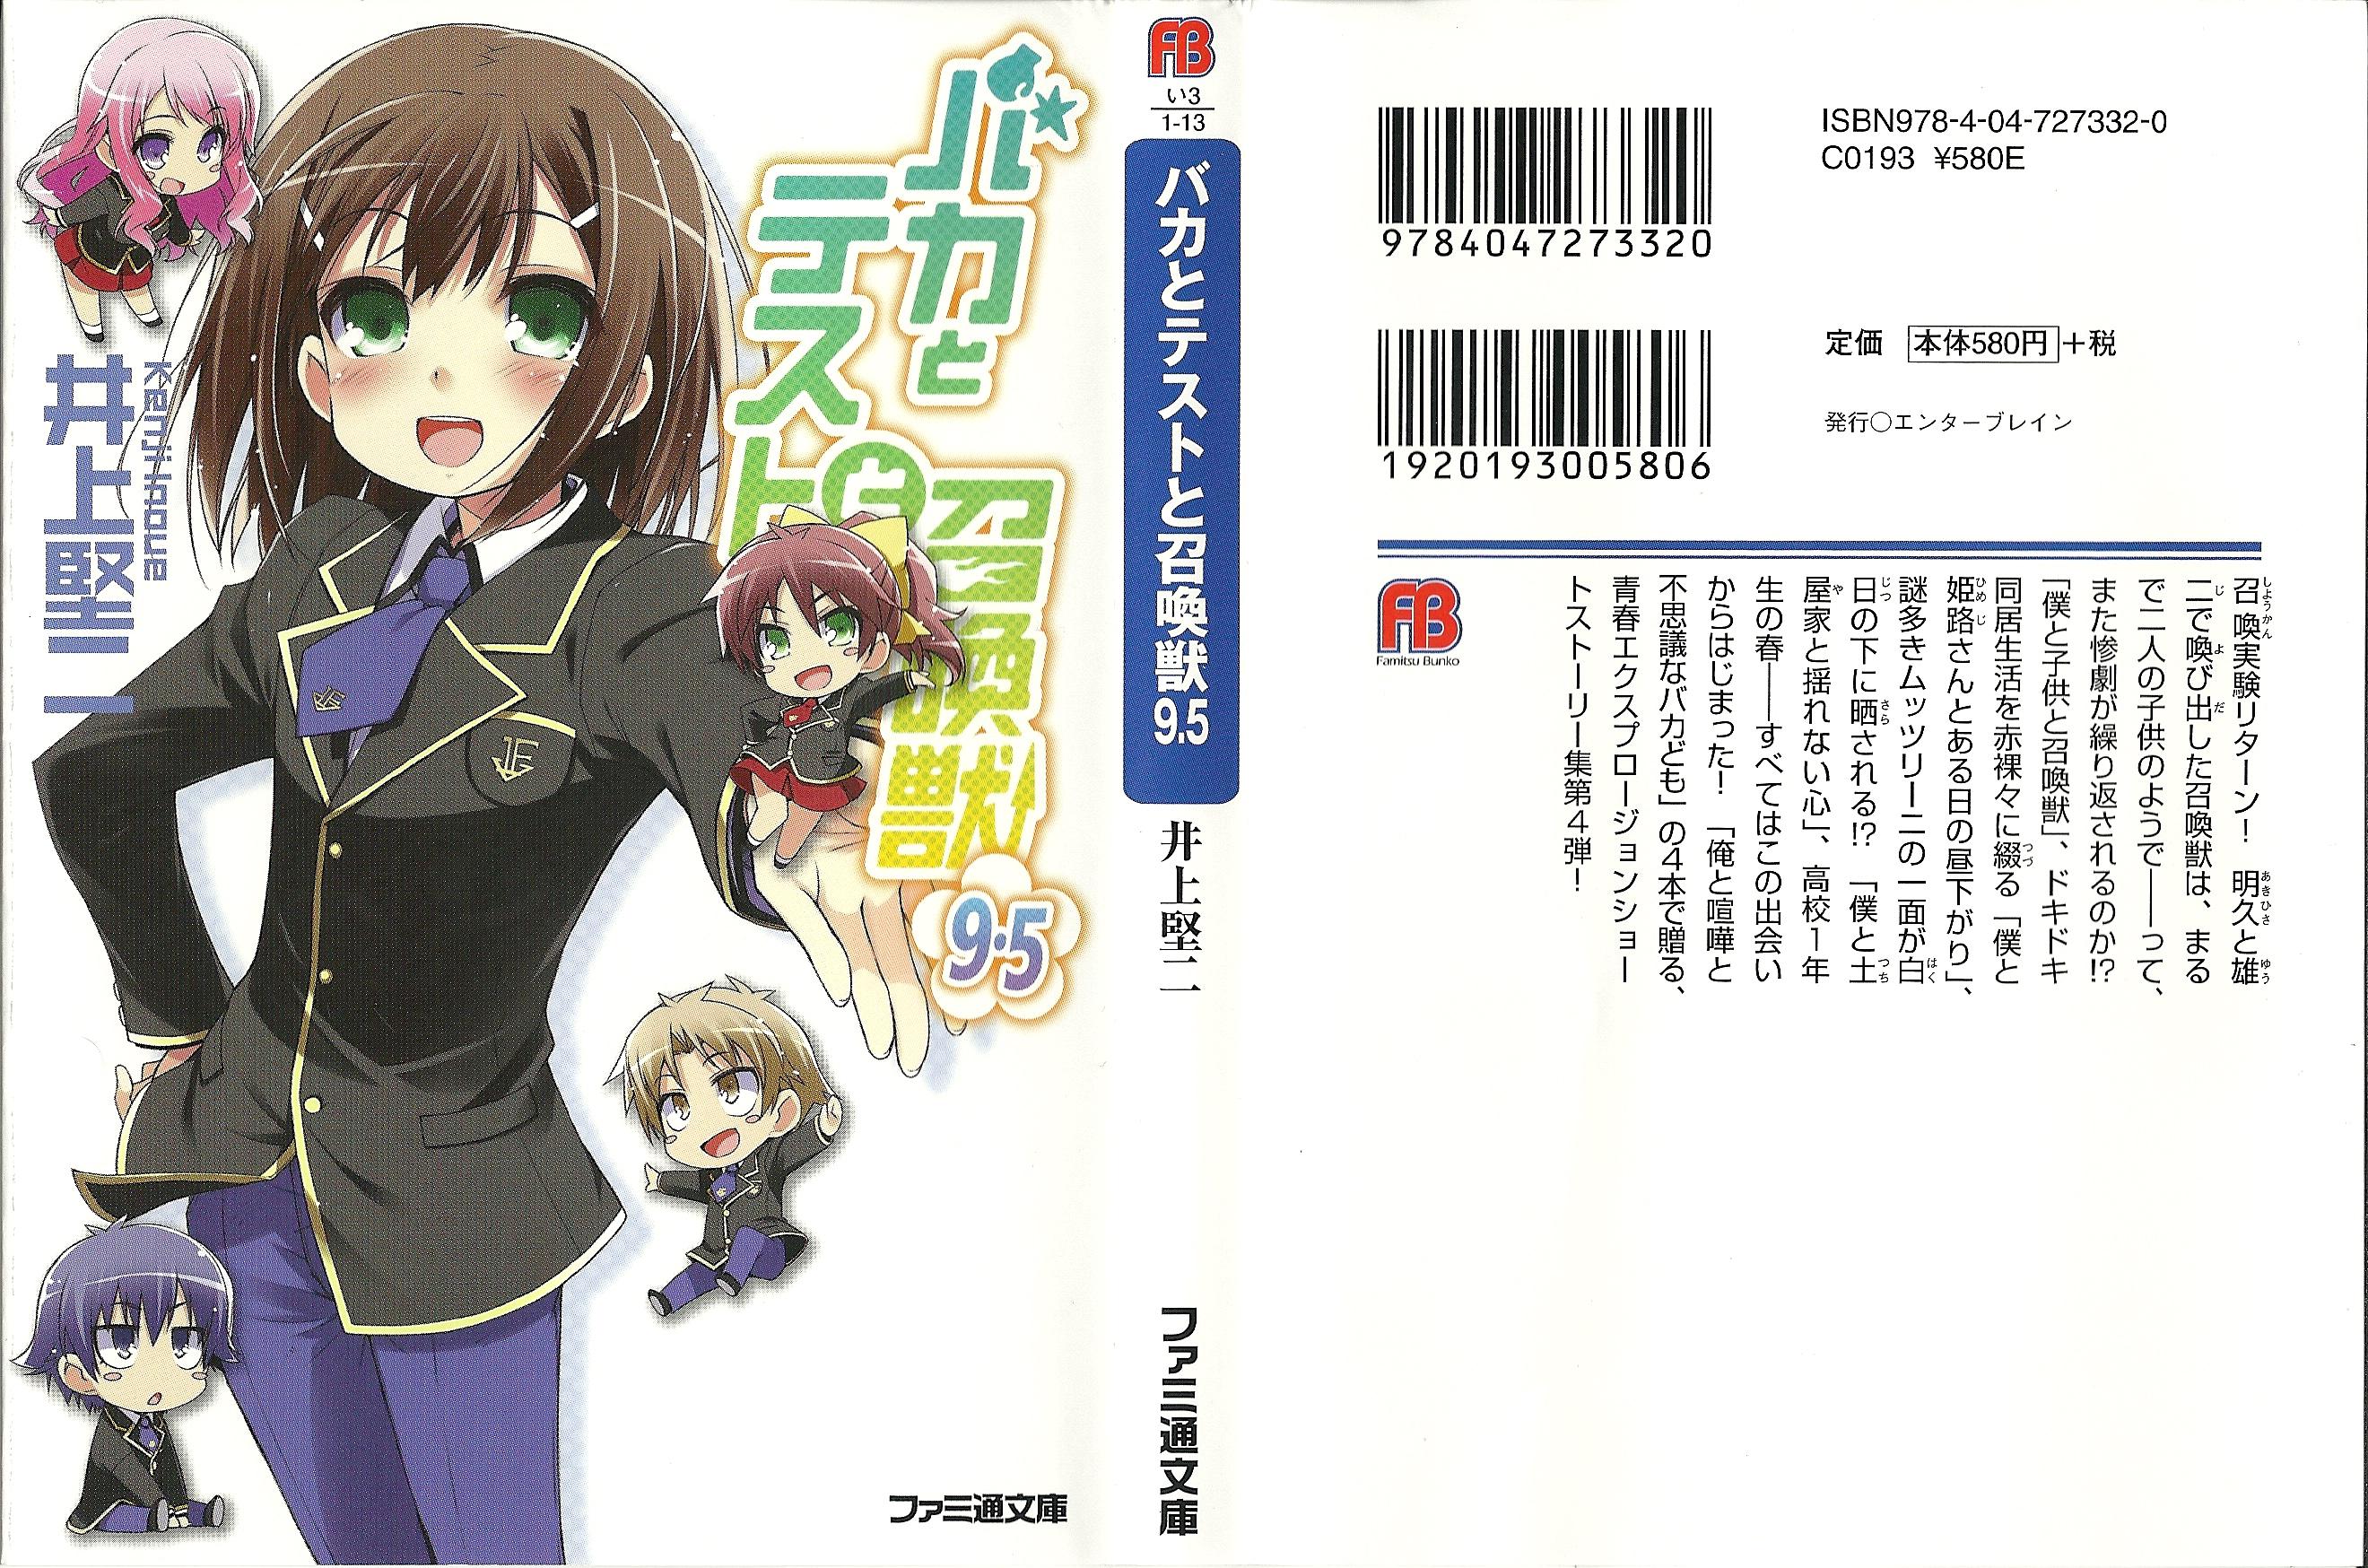 Baka to Test to Shoukanjuu: Tập 9.5 - Illustration